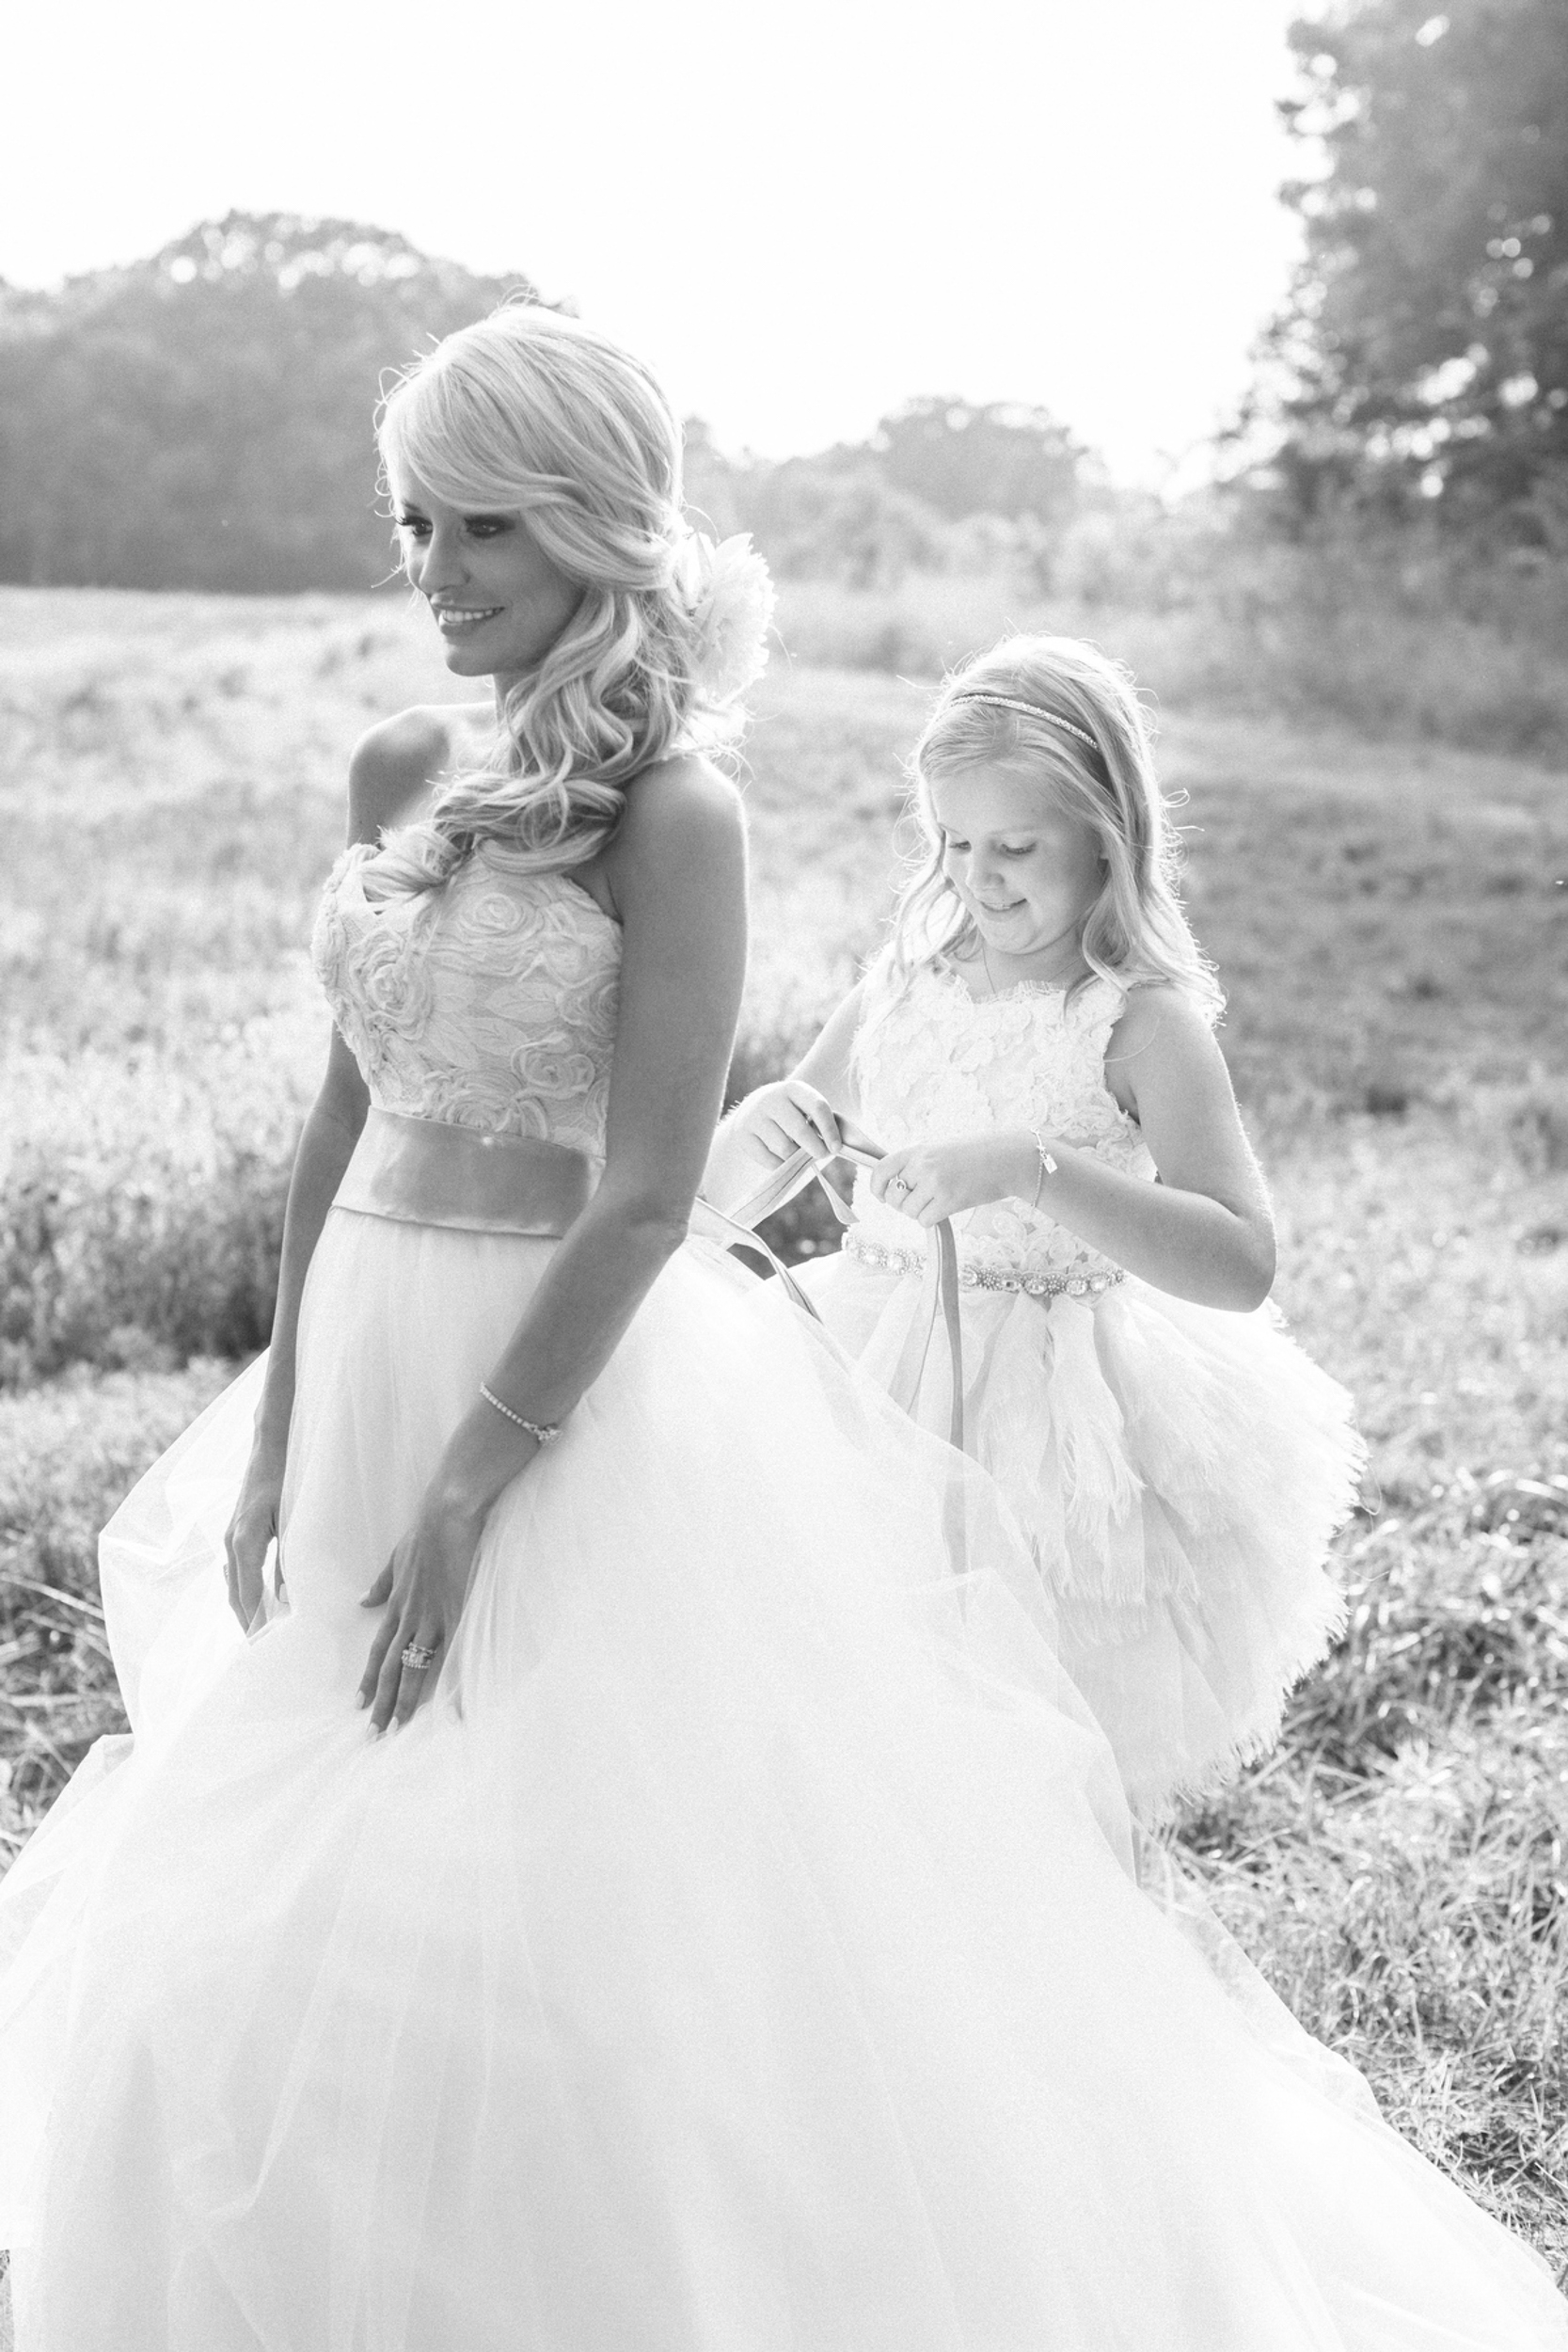 south_carolina_farm_wedding_rustic_chic_surprise_secret_luxe_wedding_bachelorette_emily_maynard_real_weddings-31.jpg